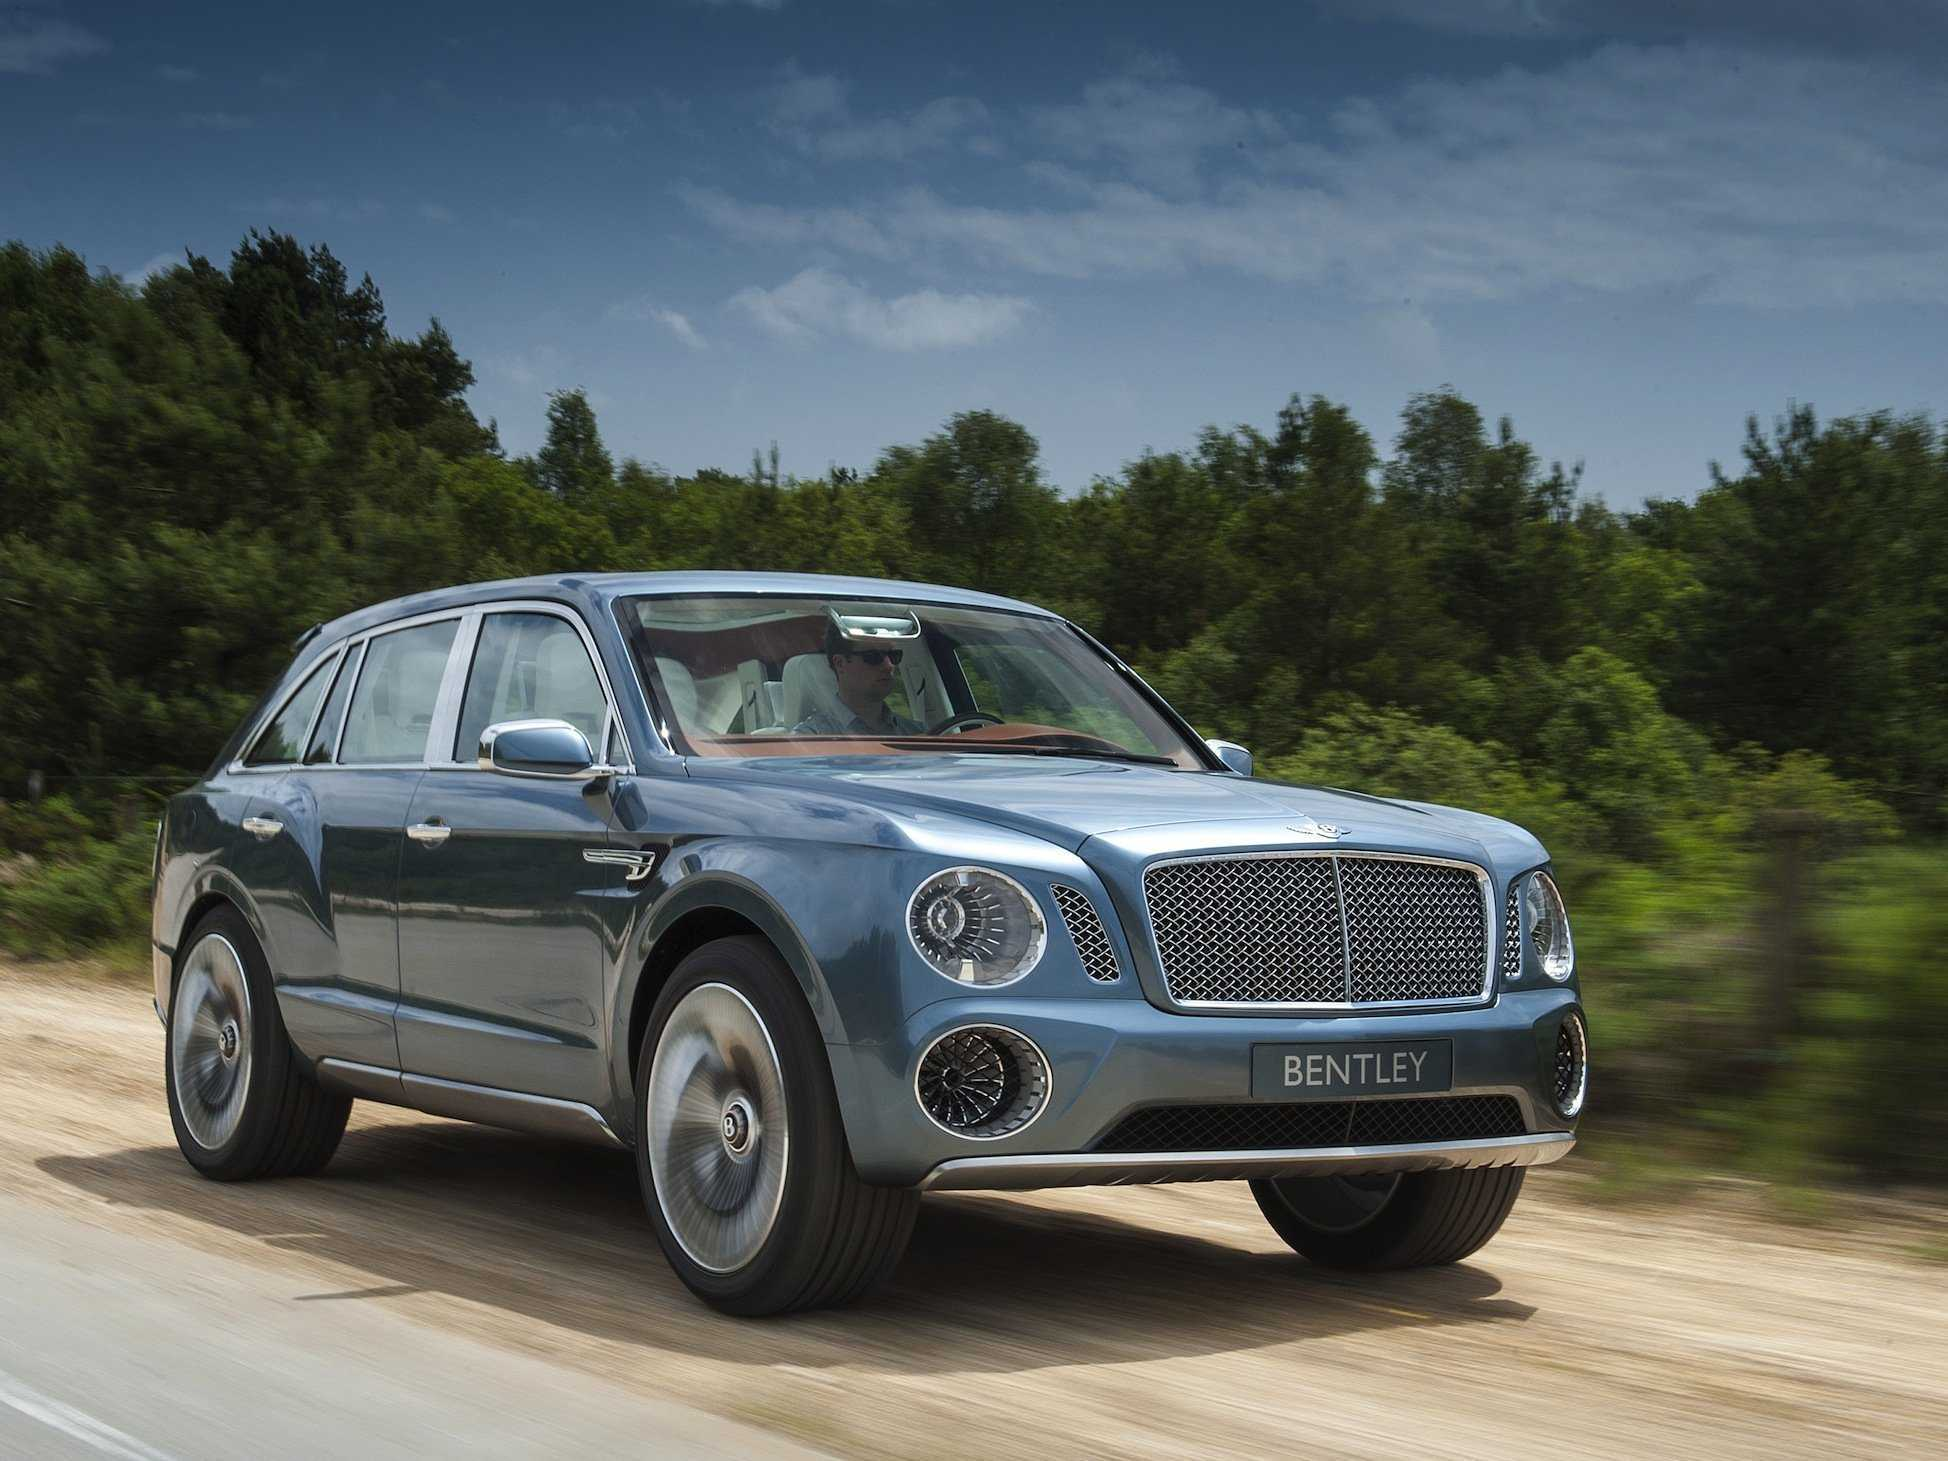 2017 Bentley Bentayga – Bentley Unleashing the Fastest SUV in the World at Frankfurt Motor Show